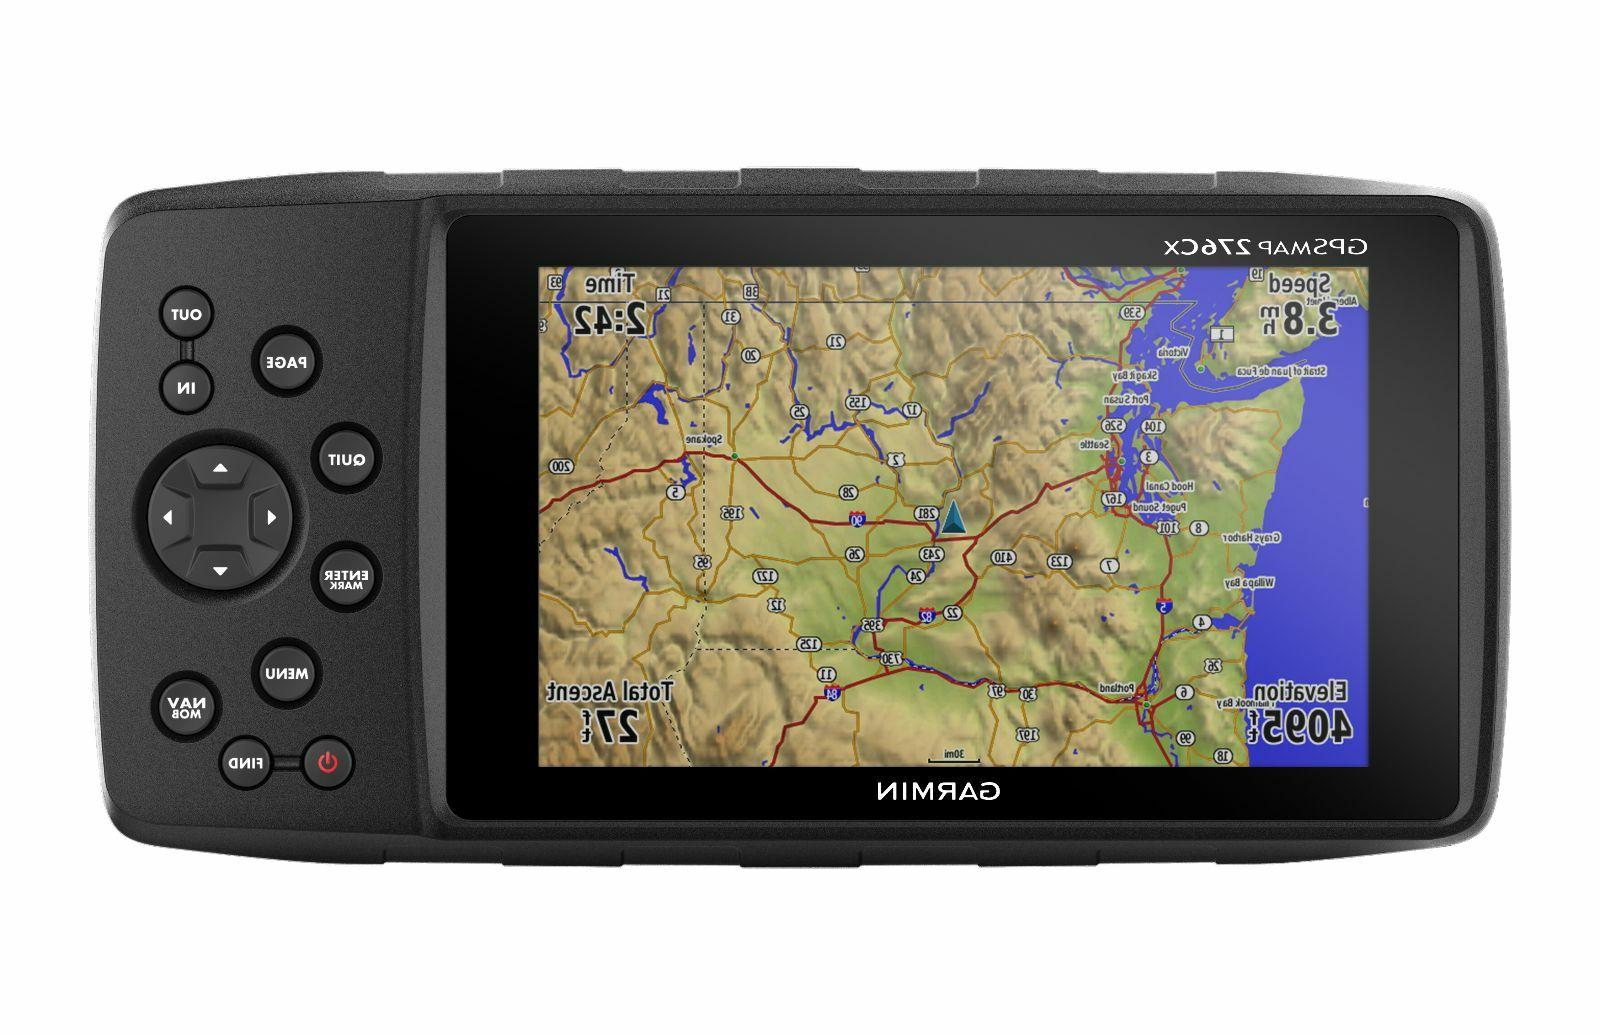 gpsmap 276cx terrain gps navigator